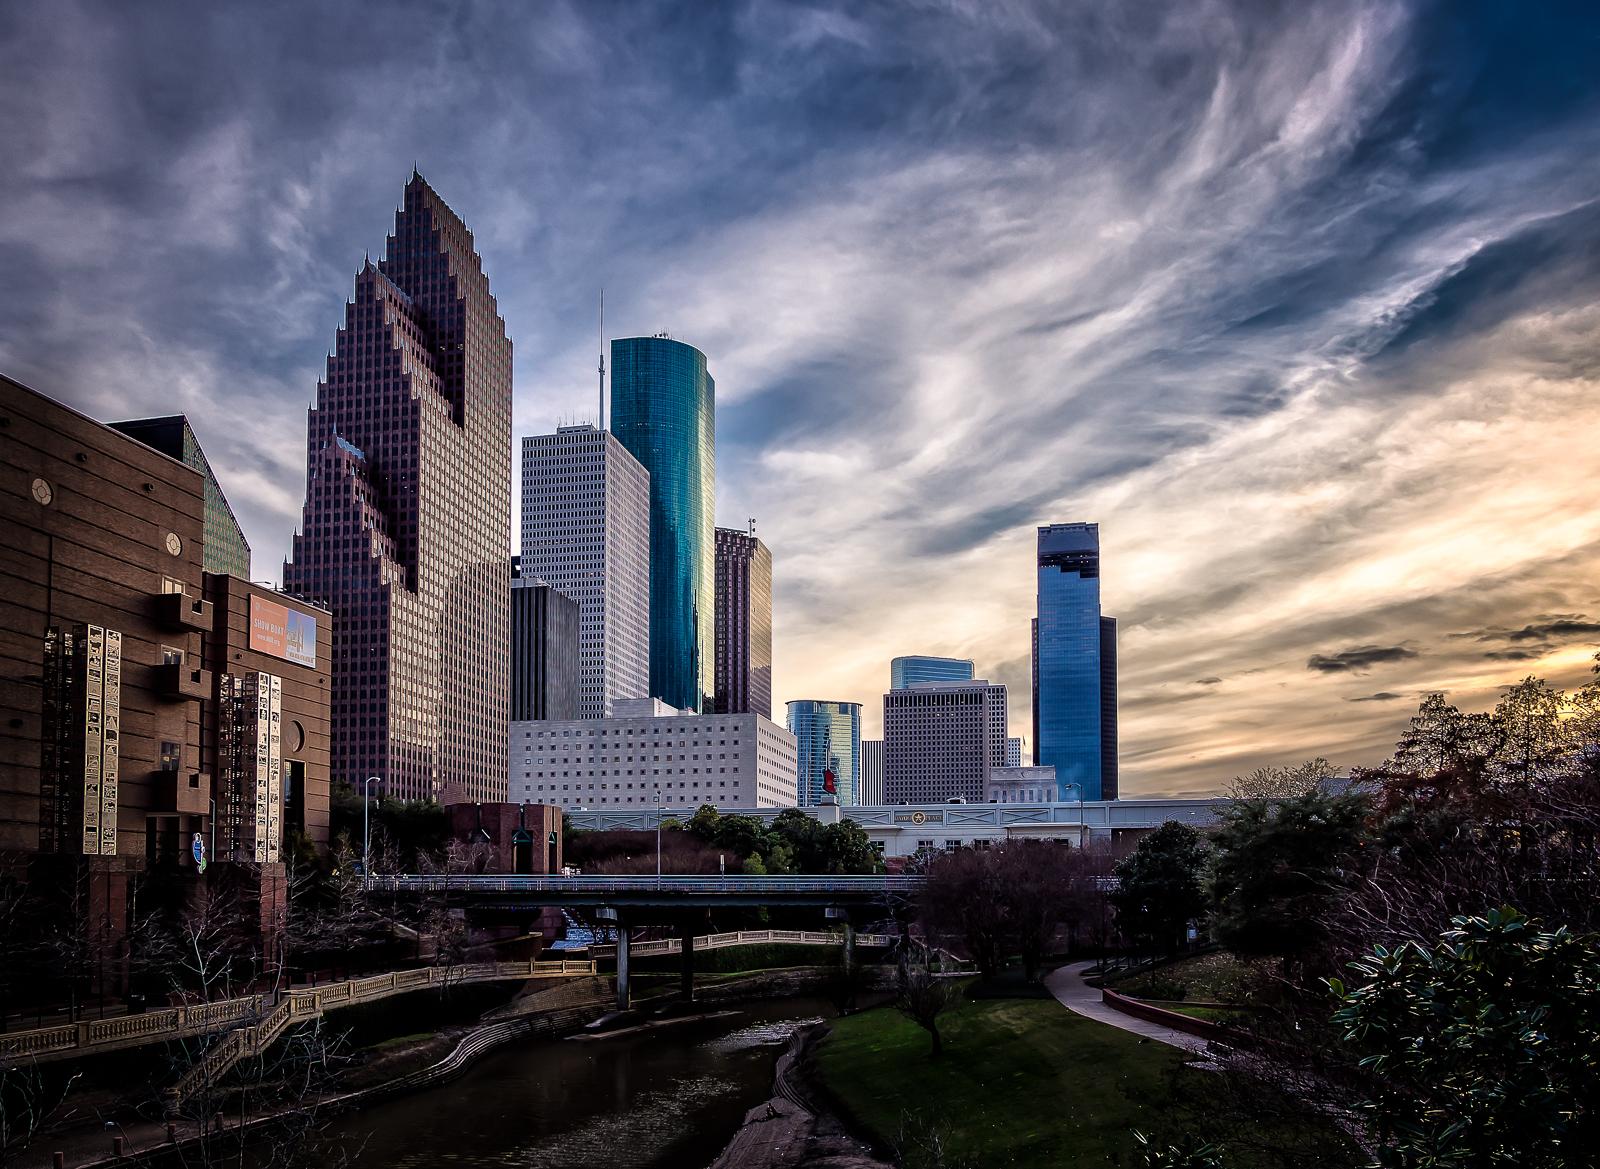 Downtown Houston from the Buffalo Bayou